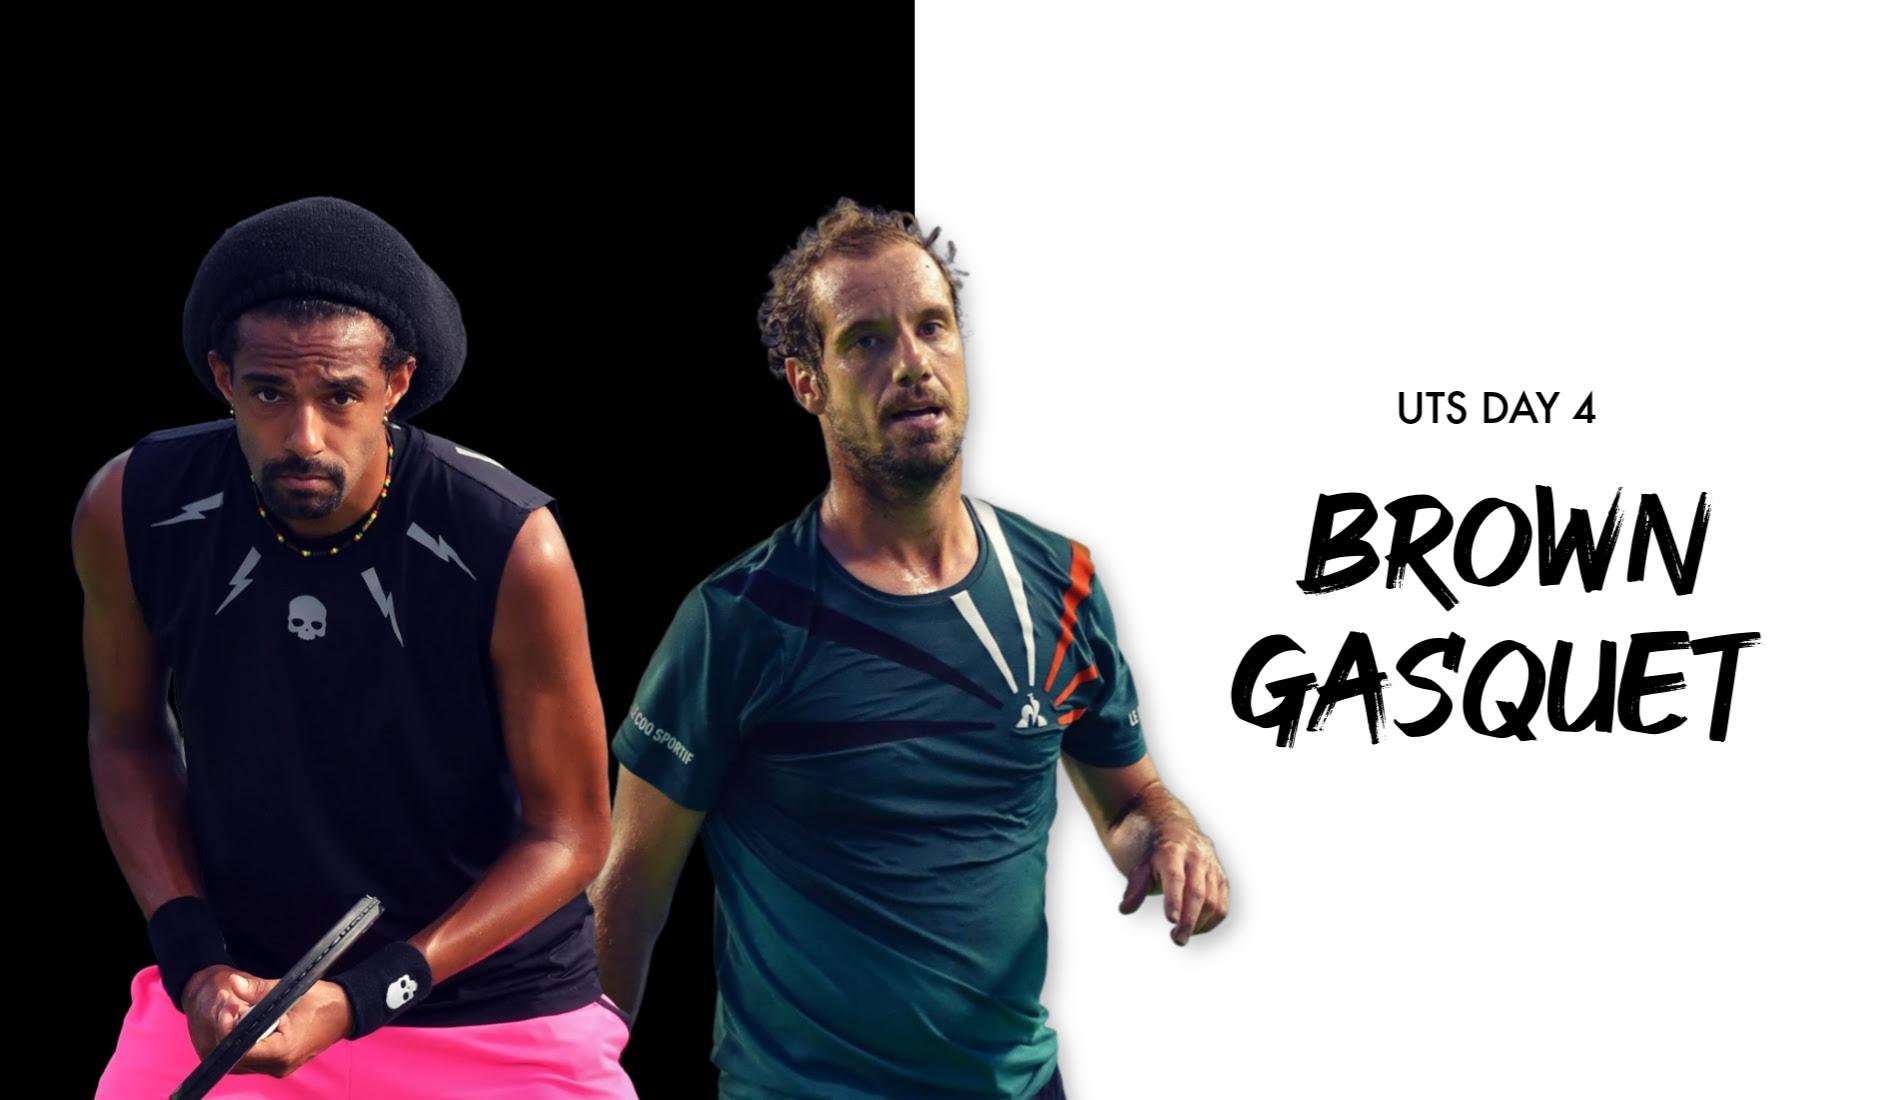 UTS1 - Day 4: Dustin Brown vs Richard Gasquet